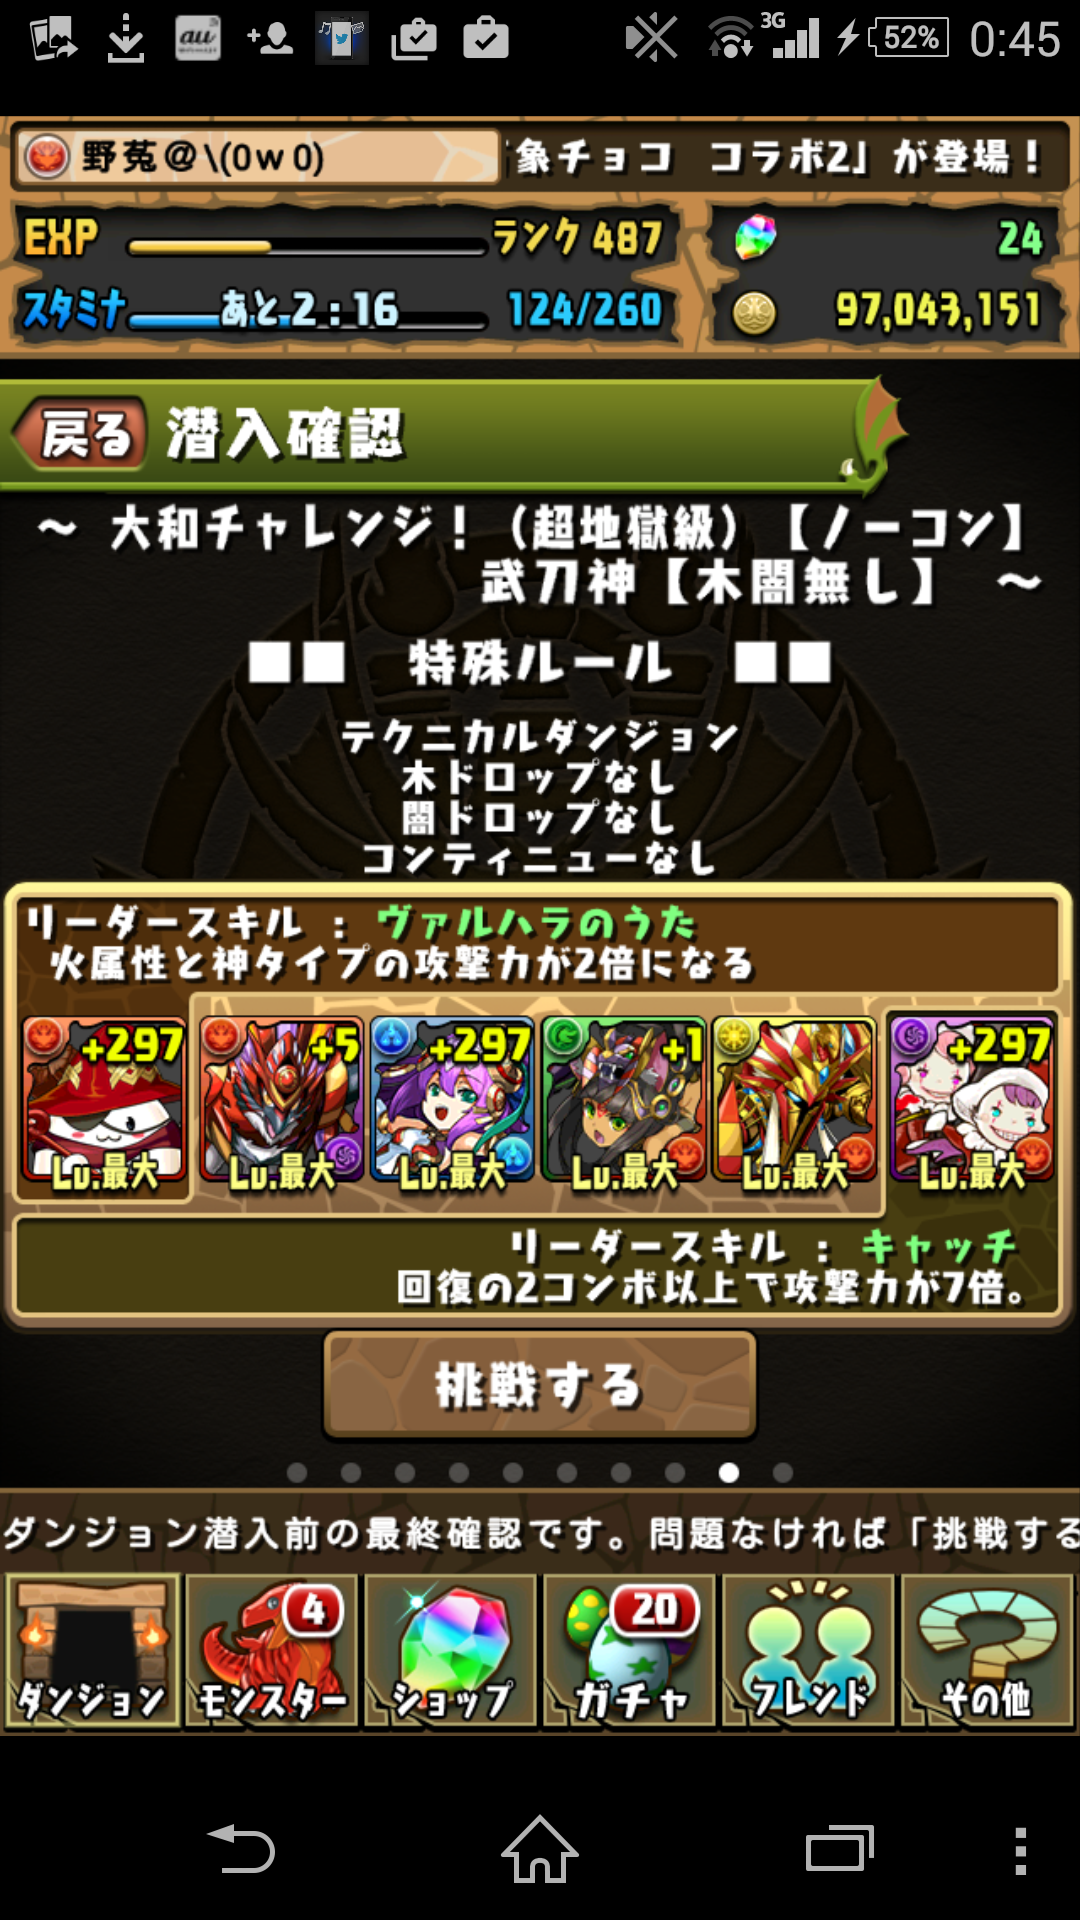 Screenshot_2015-04-10-00-45-41.png